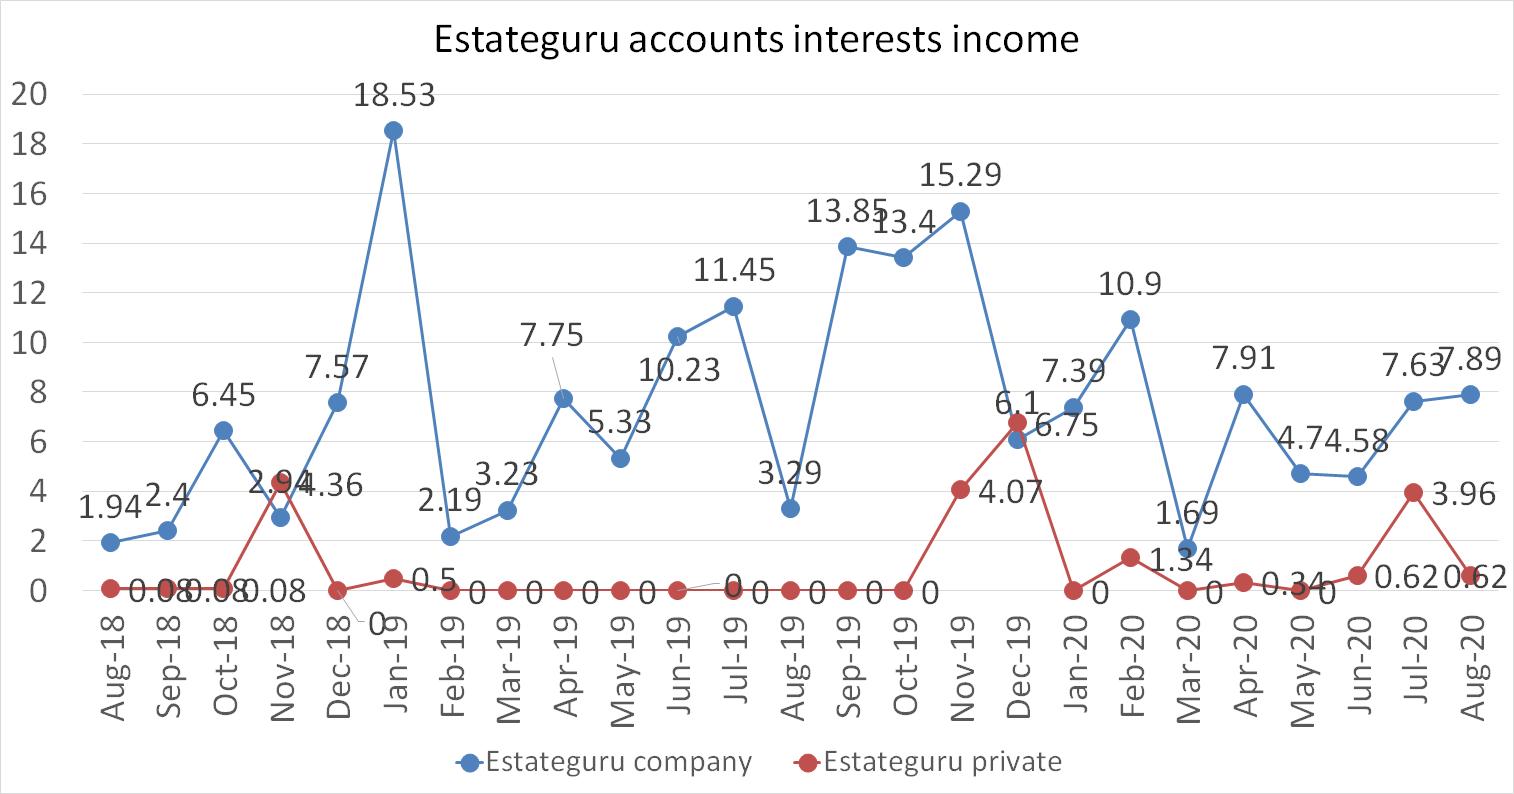 Estateguru accounts interests income august 2020